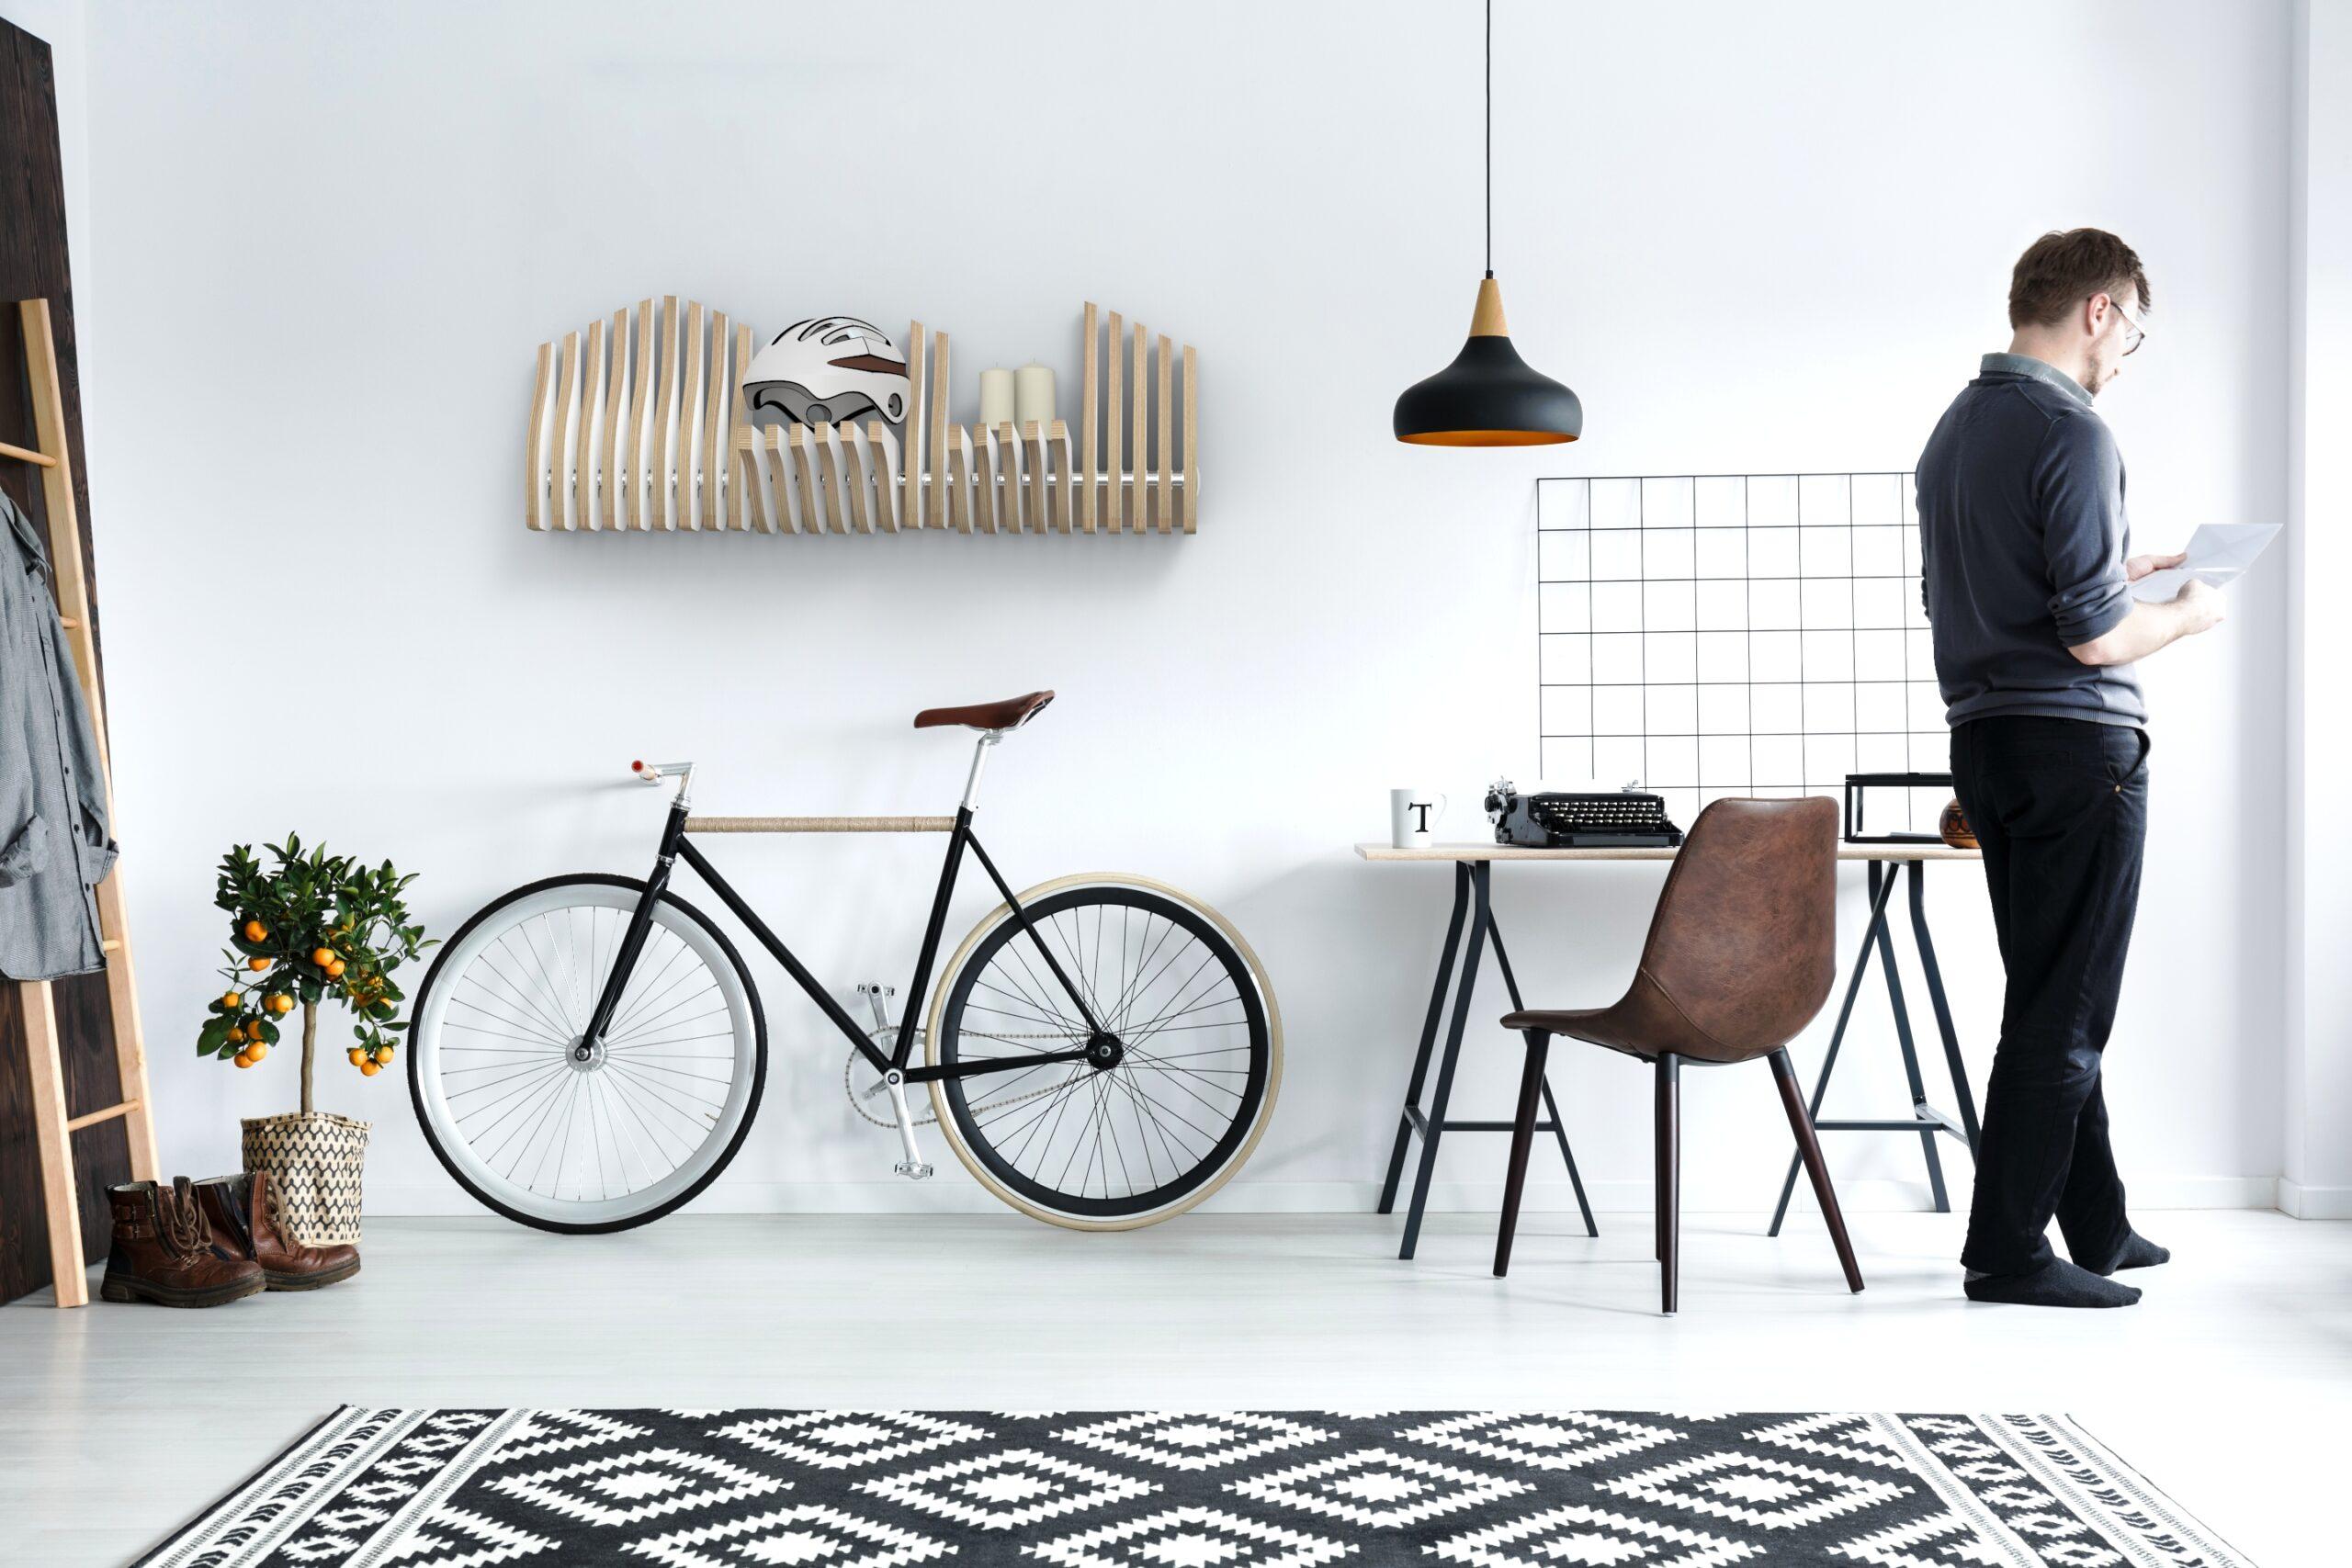 Köllen Bookshelf White. Nodic and minimalistic interior design style.